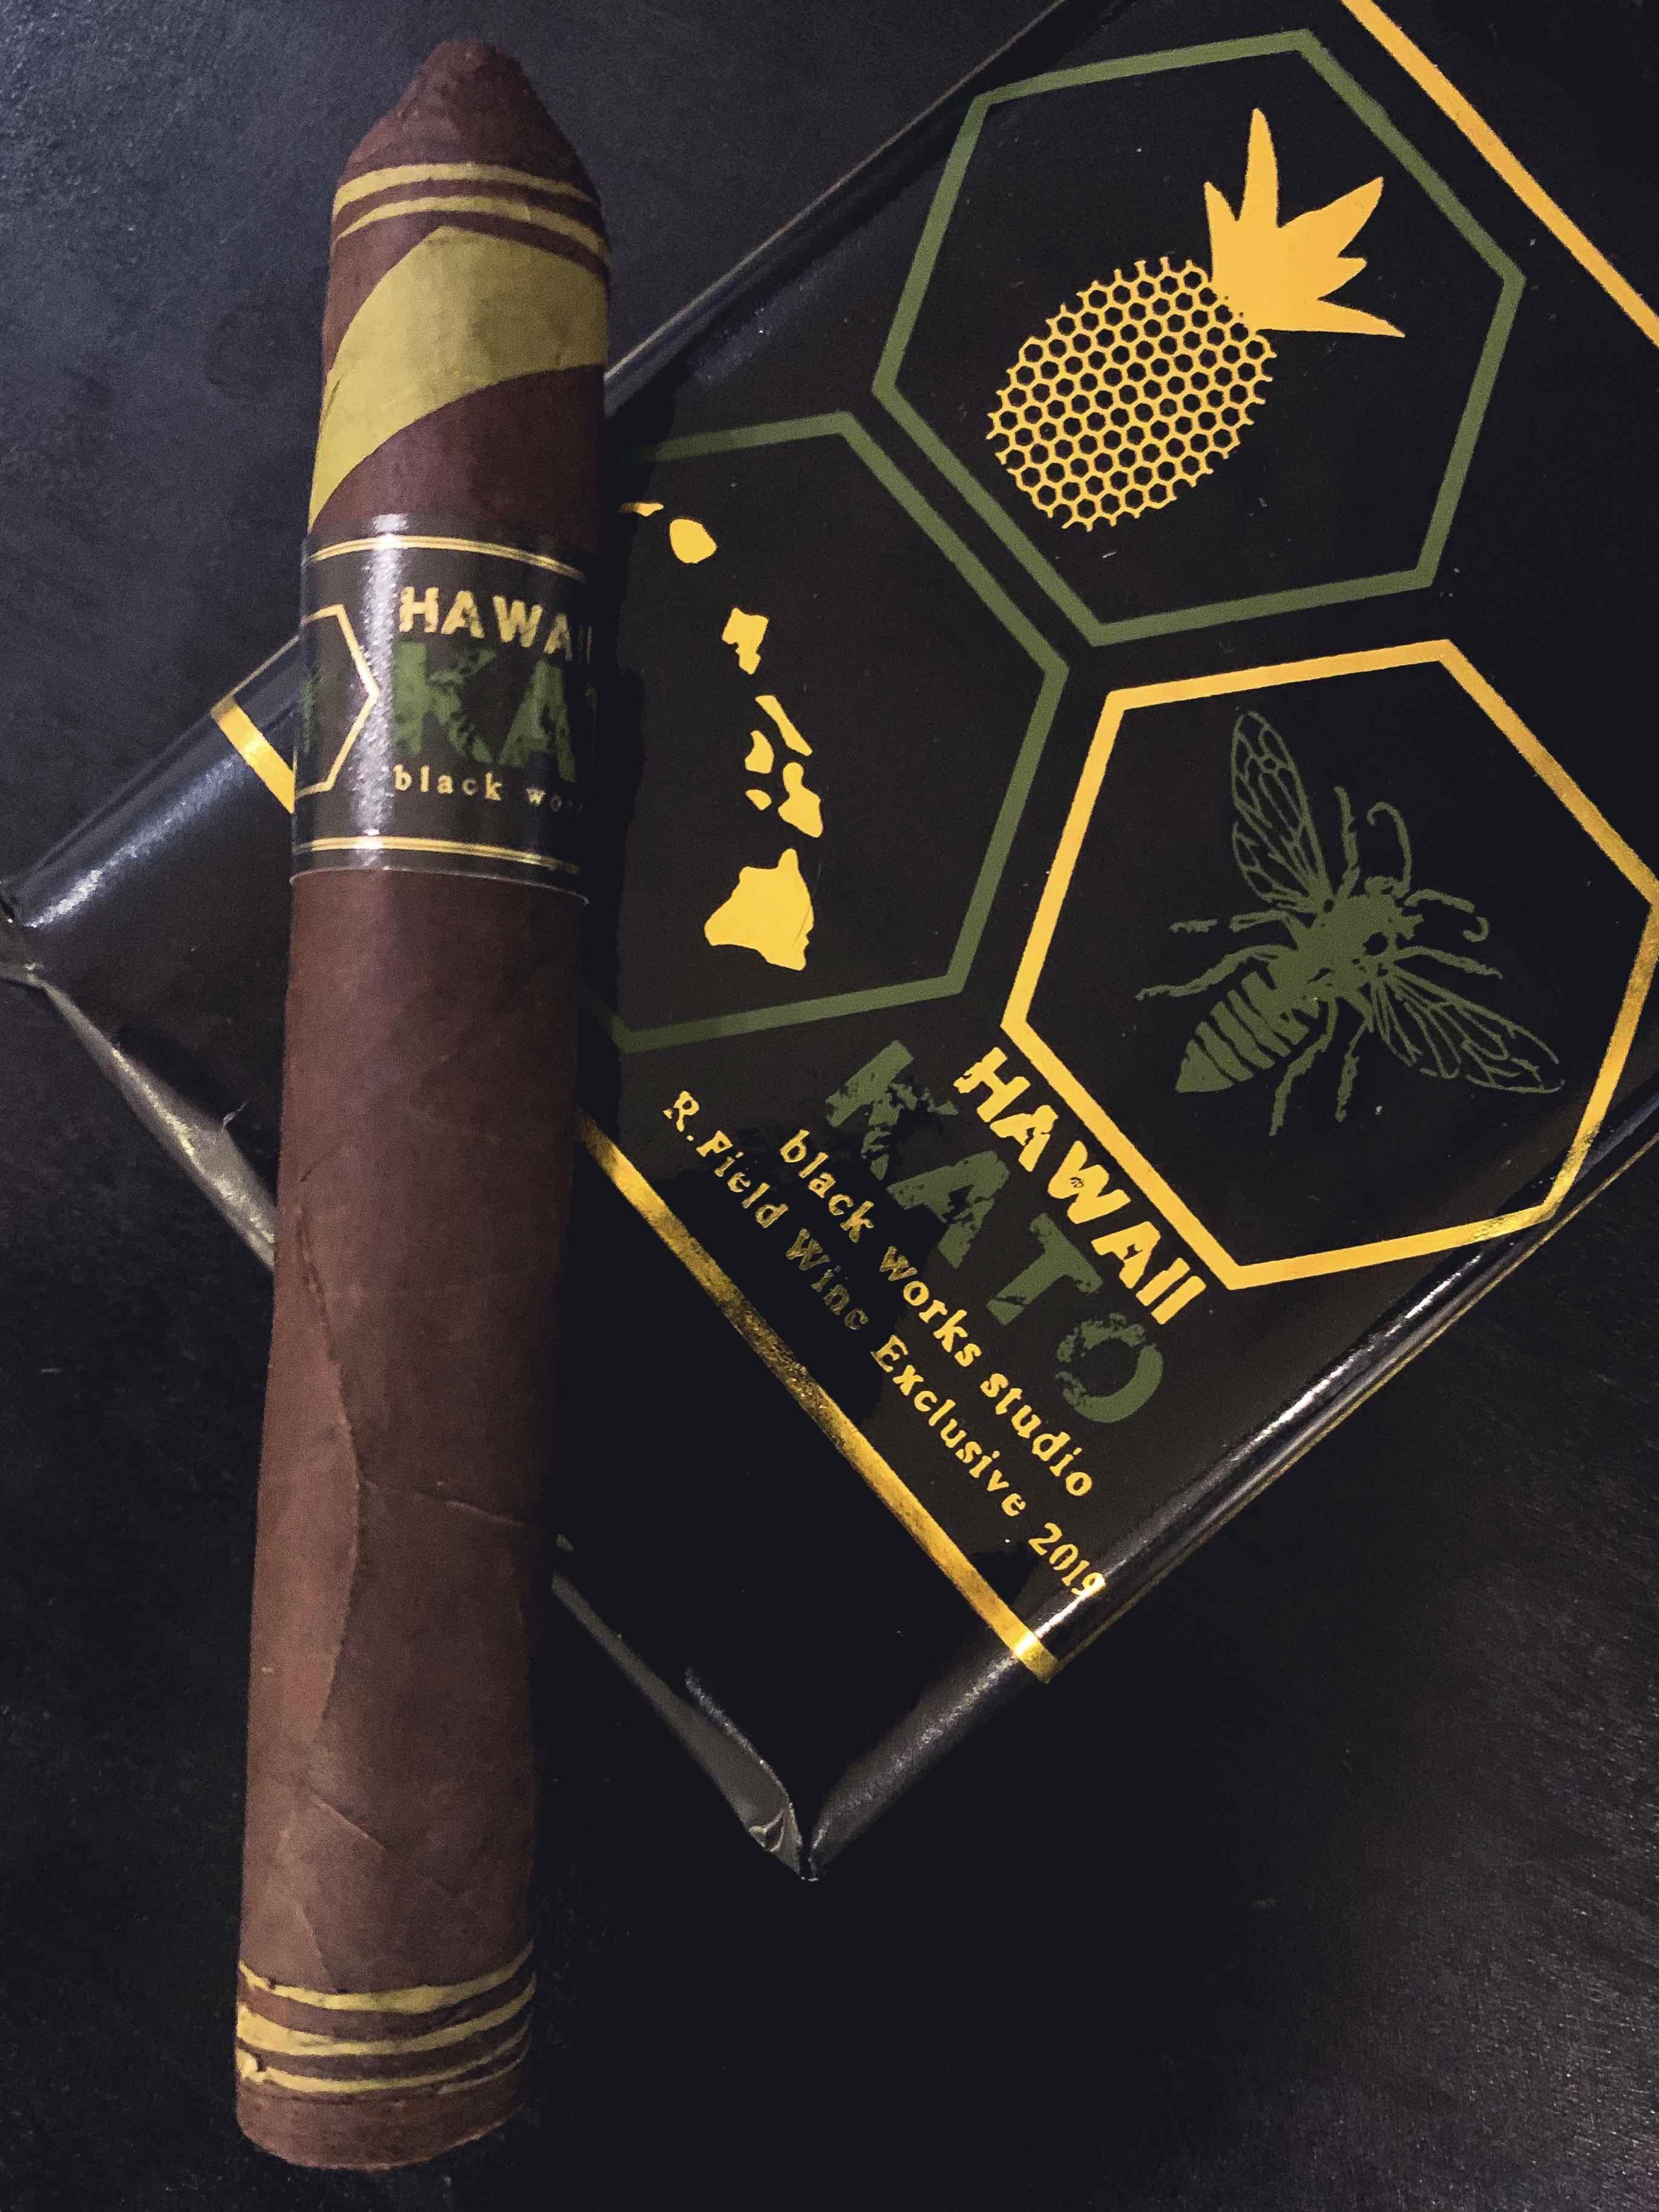 Cigar News: Oveja Negra Brands Announces Black Works Studio Hawaii Kato Shop Exclusive